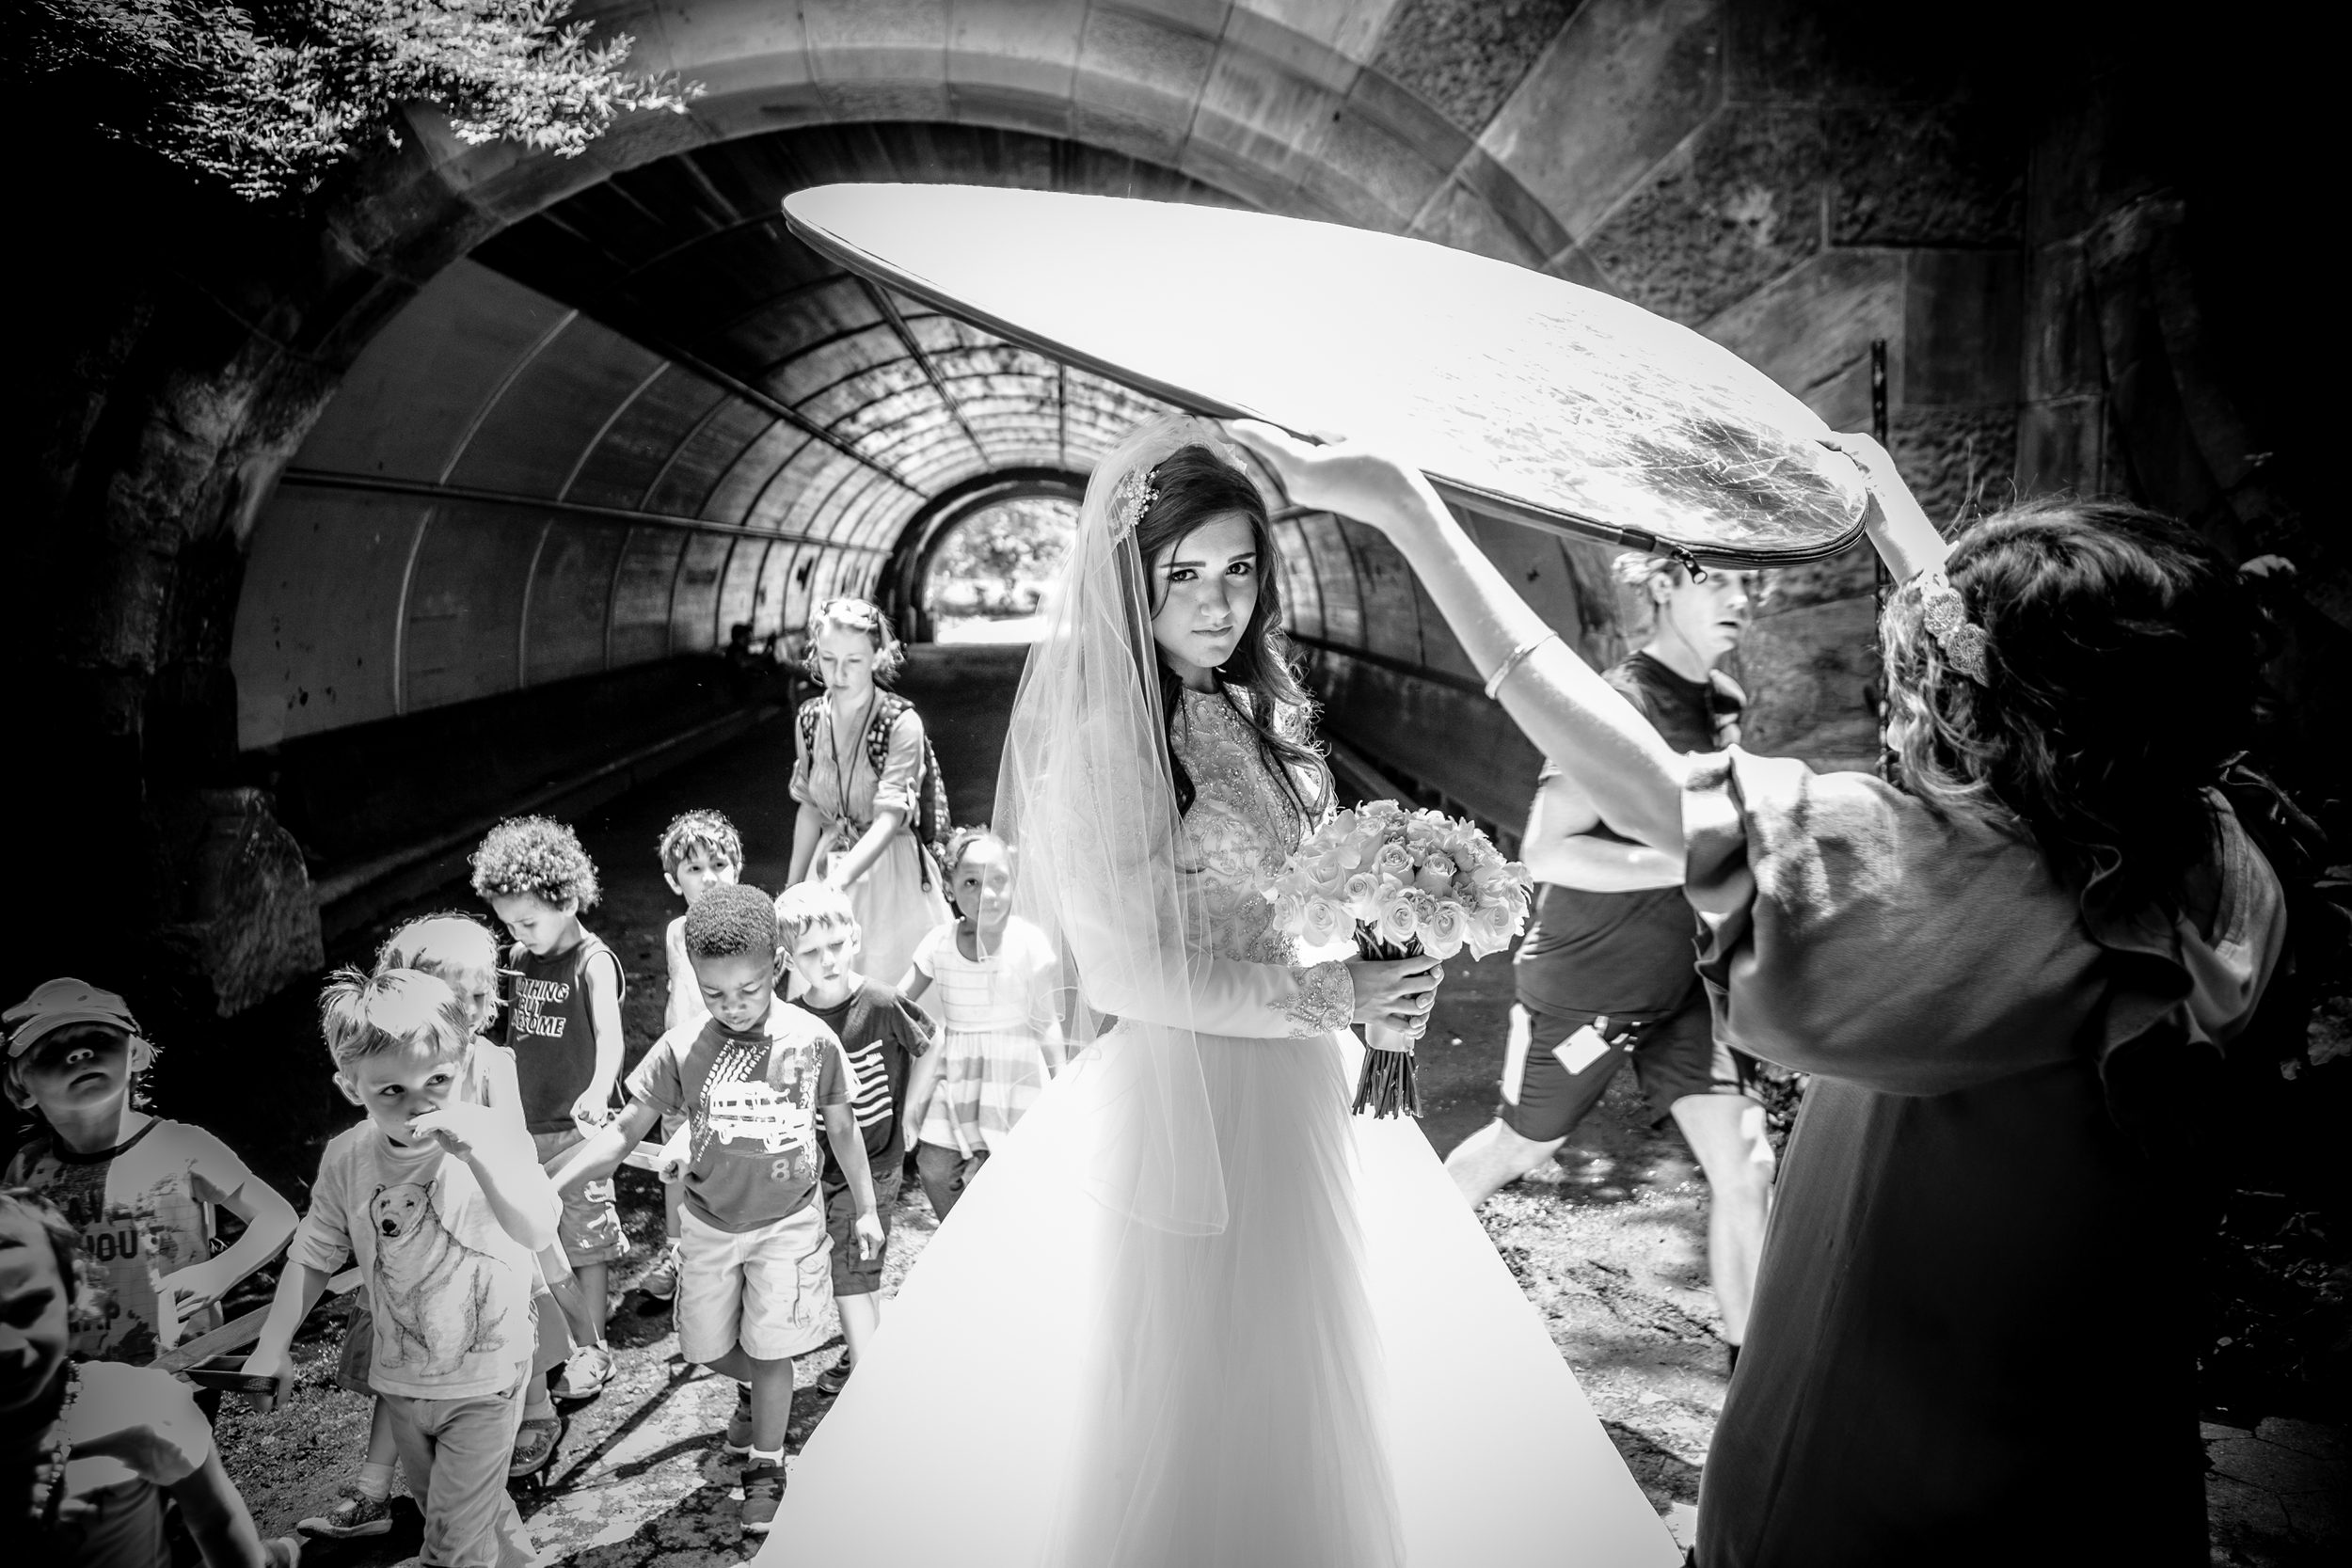 Wedding Iossi and Gitty Khafif  - Eliau Piha studio photography, new york, events, people 770 brooklyn -0104.jpg